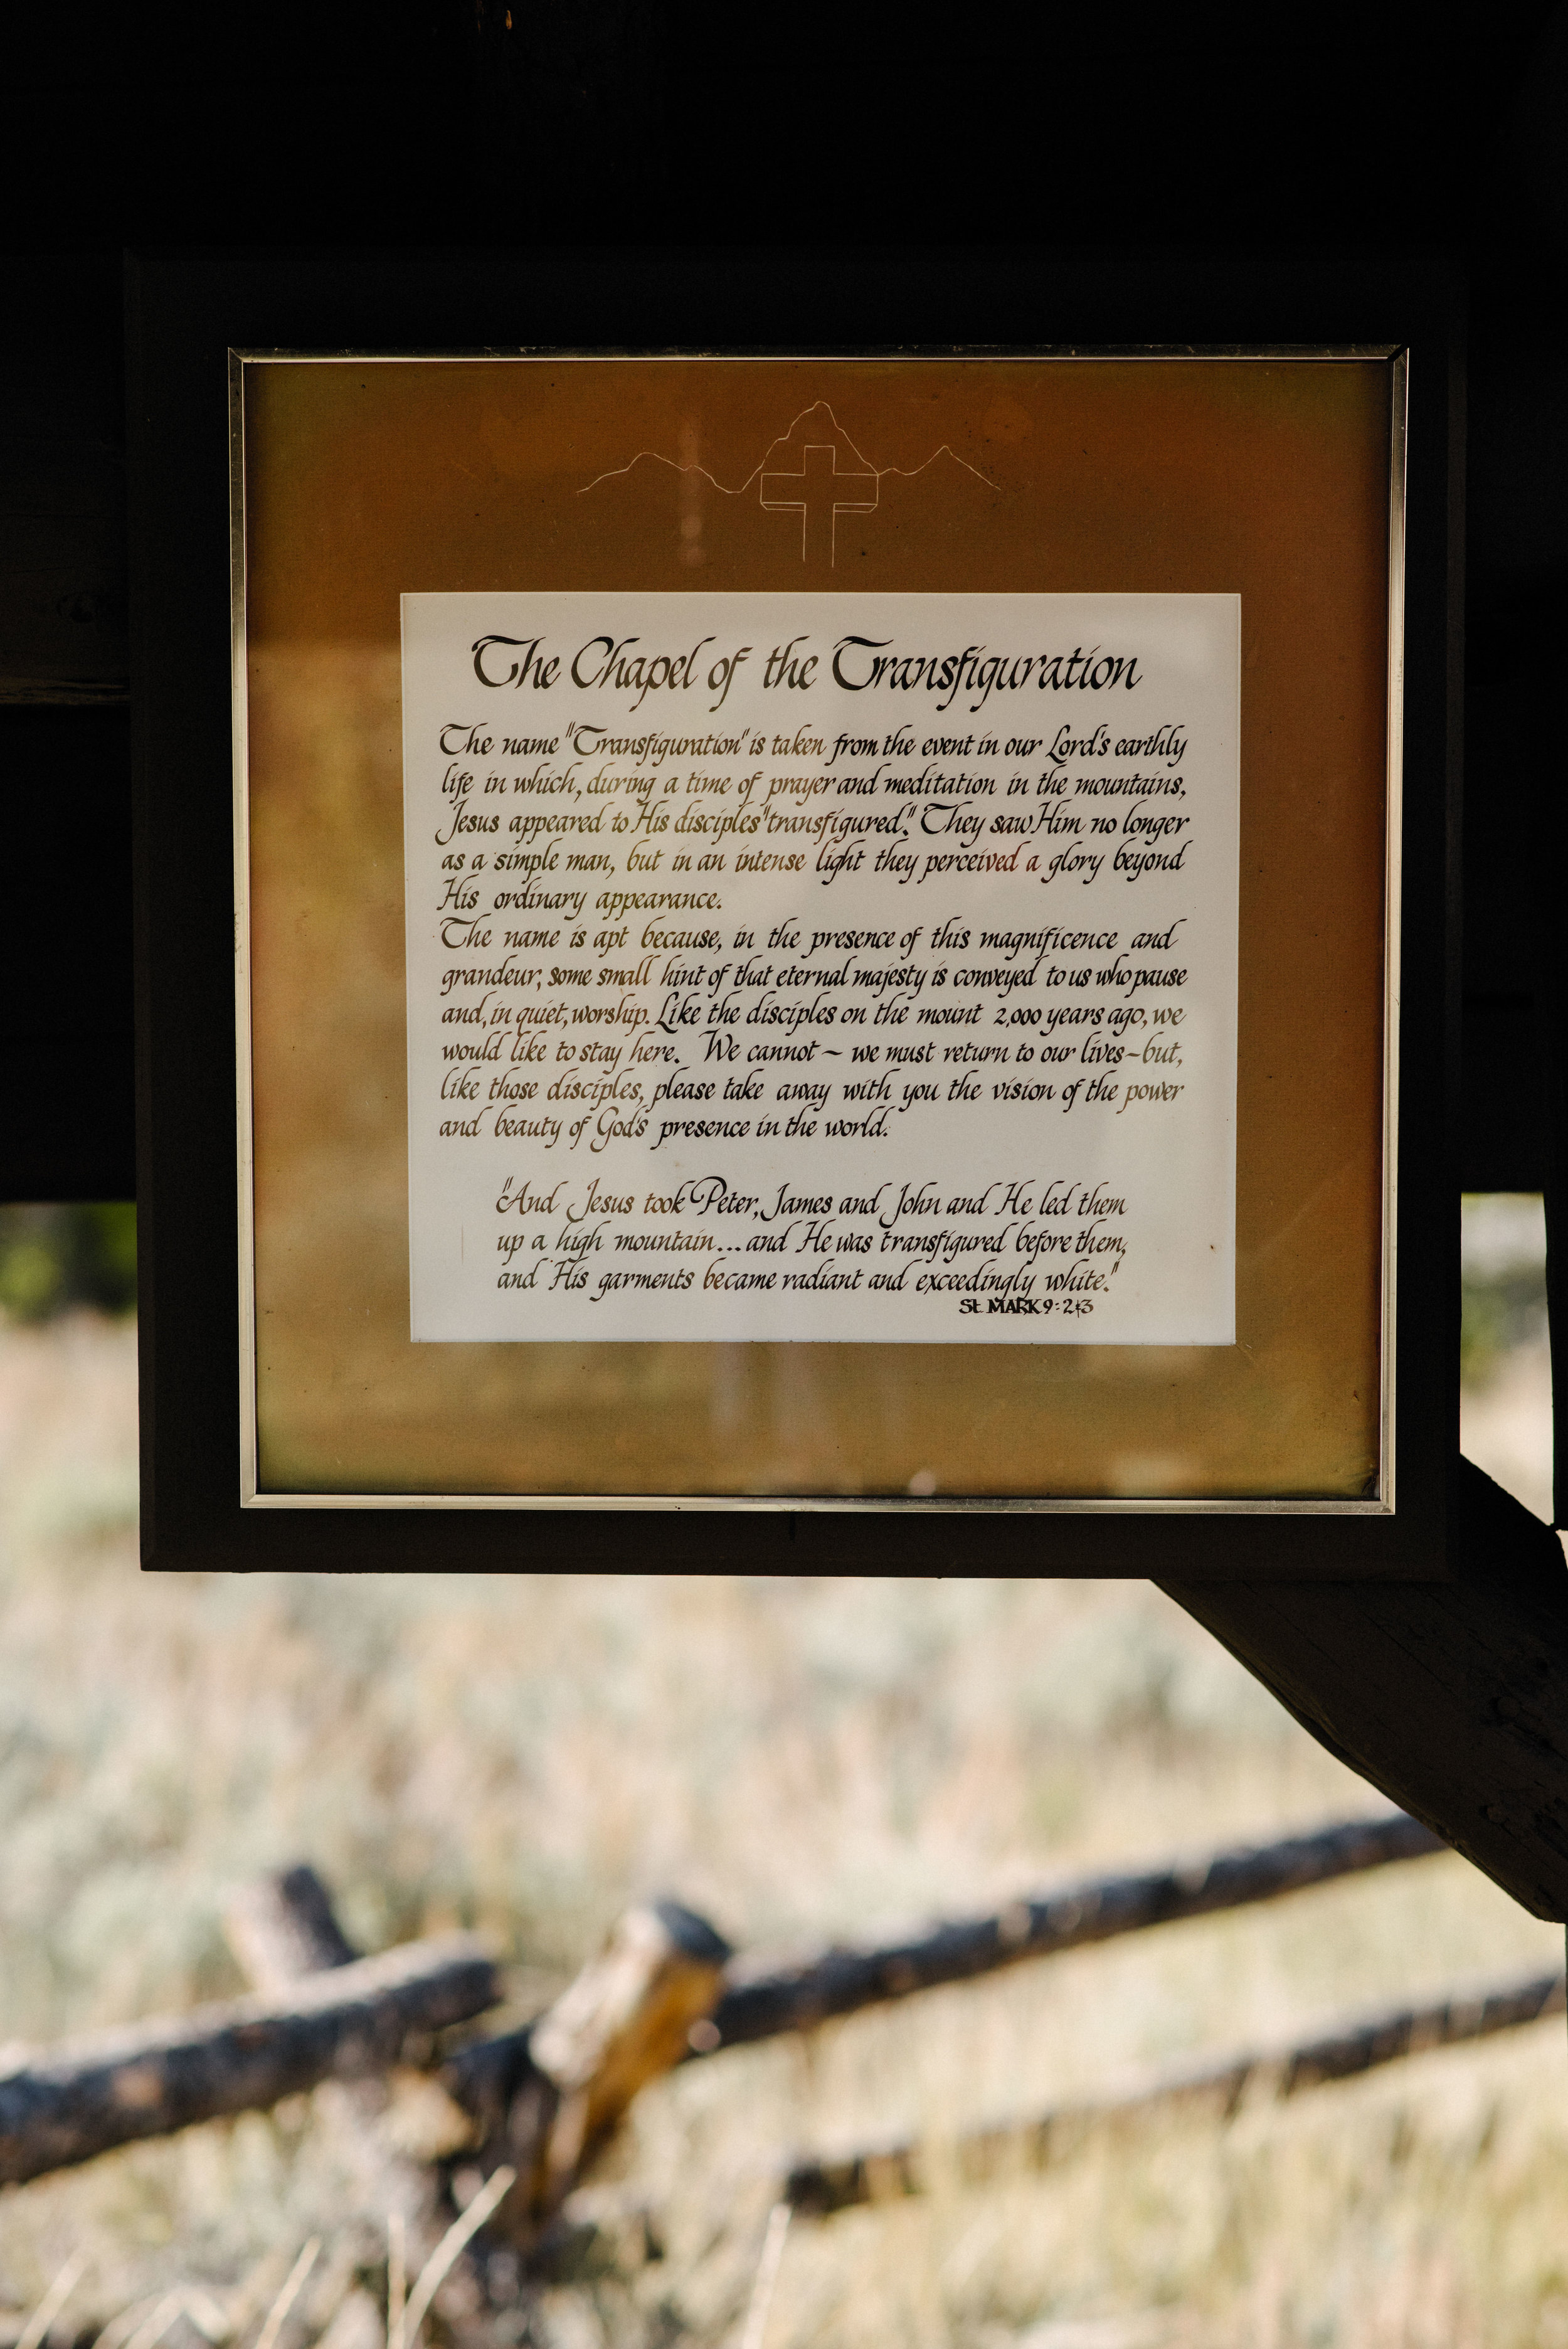 Jackson_Hole_Wedding_Photography_Wyoming_Elopement_Destination_Wedding_Photographer-5.jpg